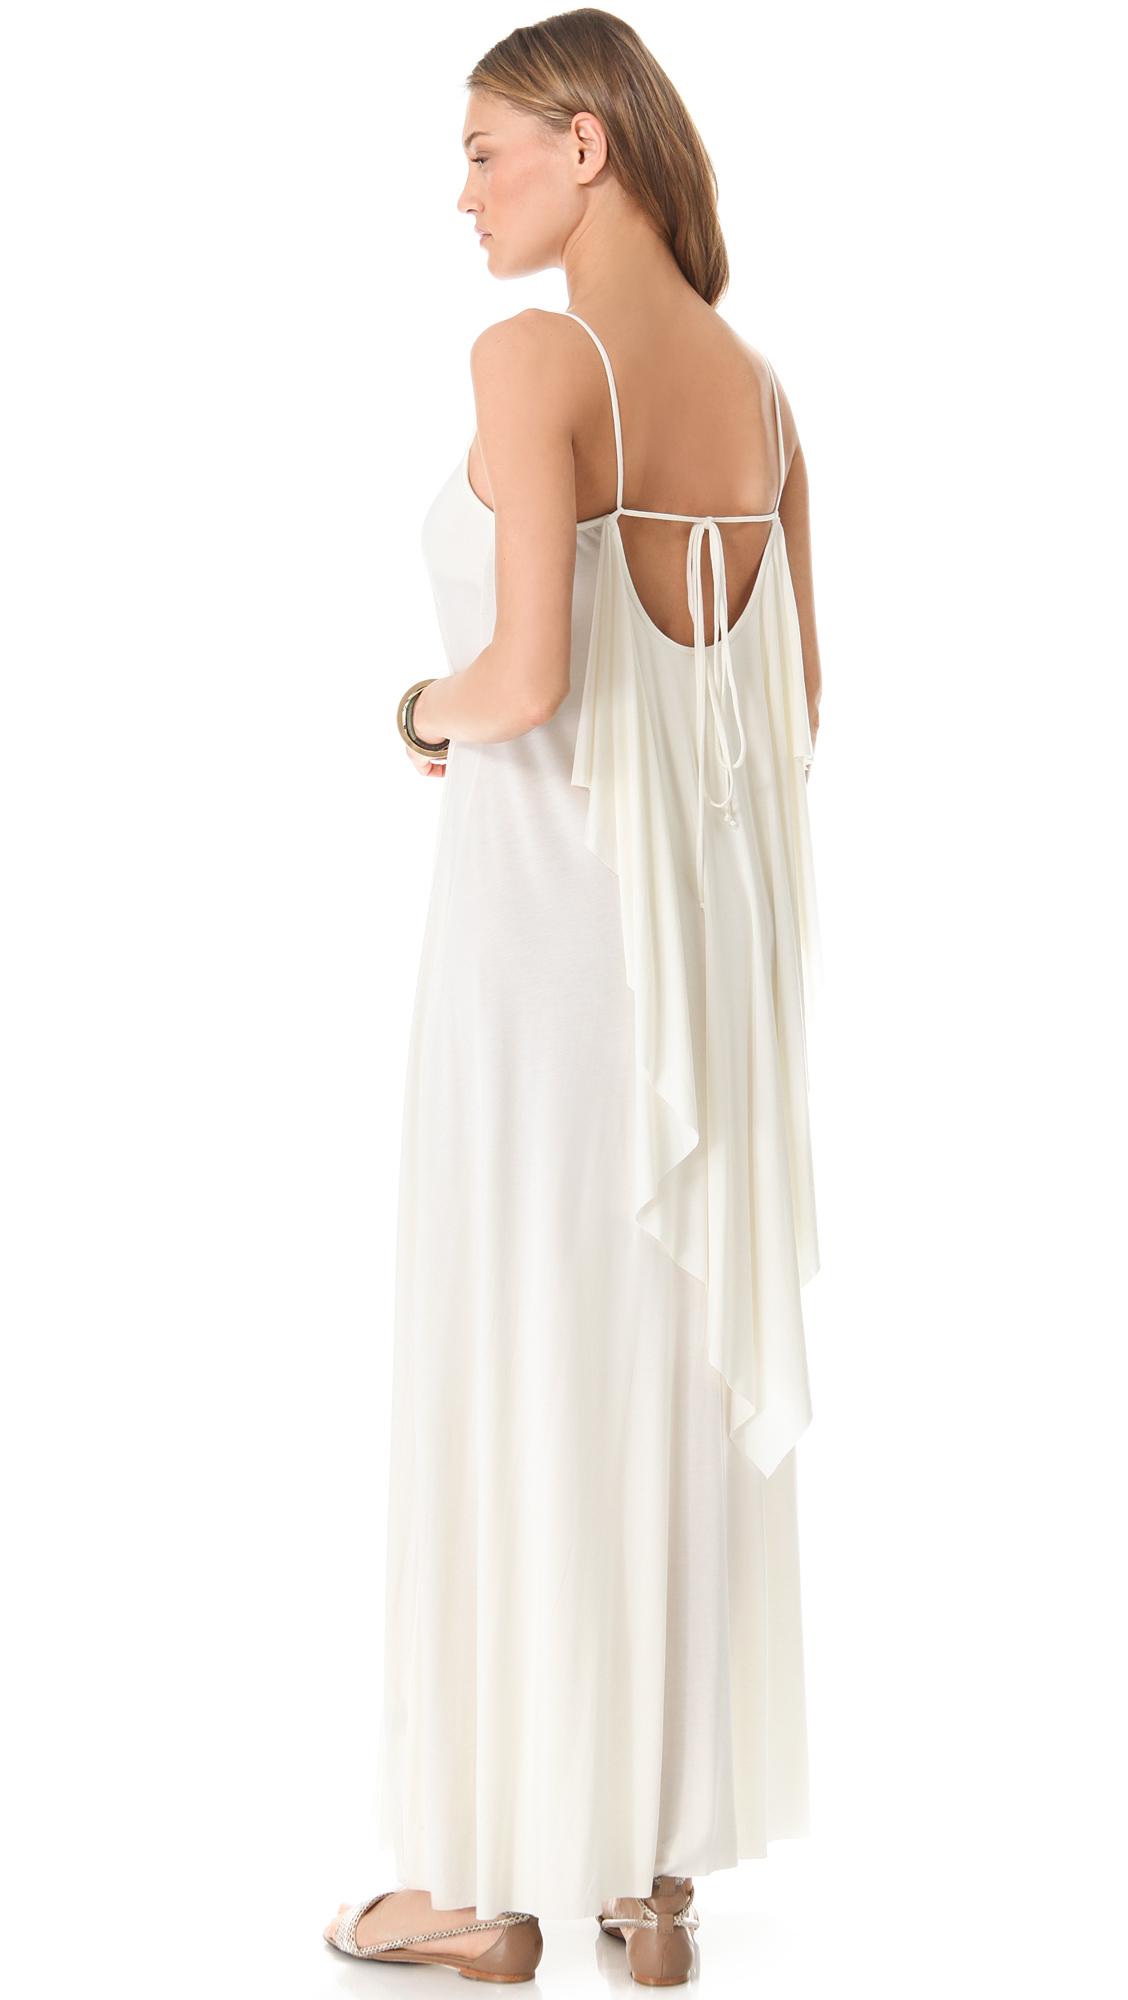 d6a1e42a024 Lyst - Rachel Pally Lyle Dress in White